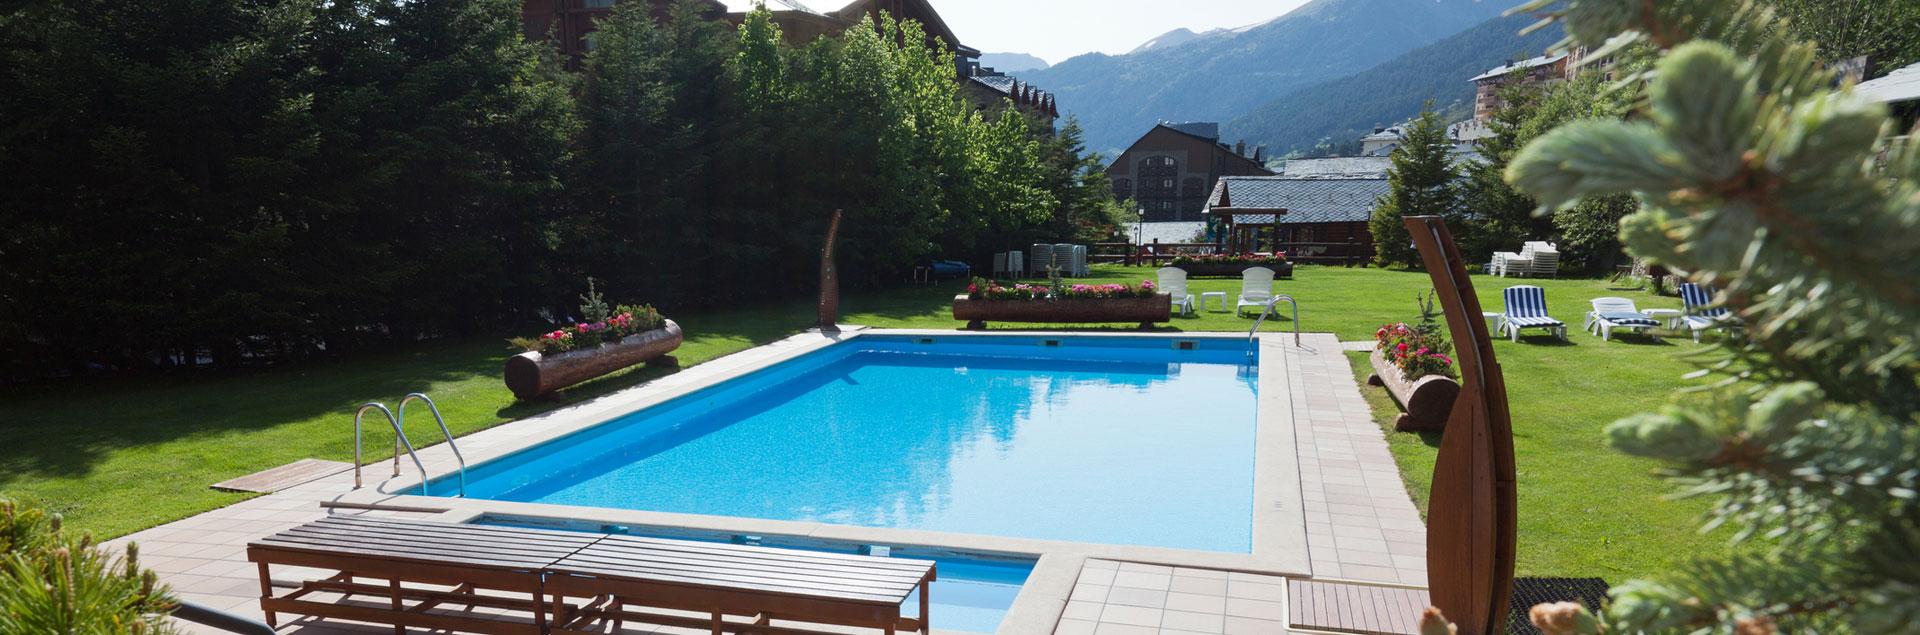 Piscine ext rieure sport hotels andorre for Piscine andorre